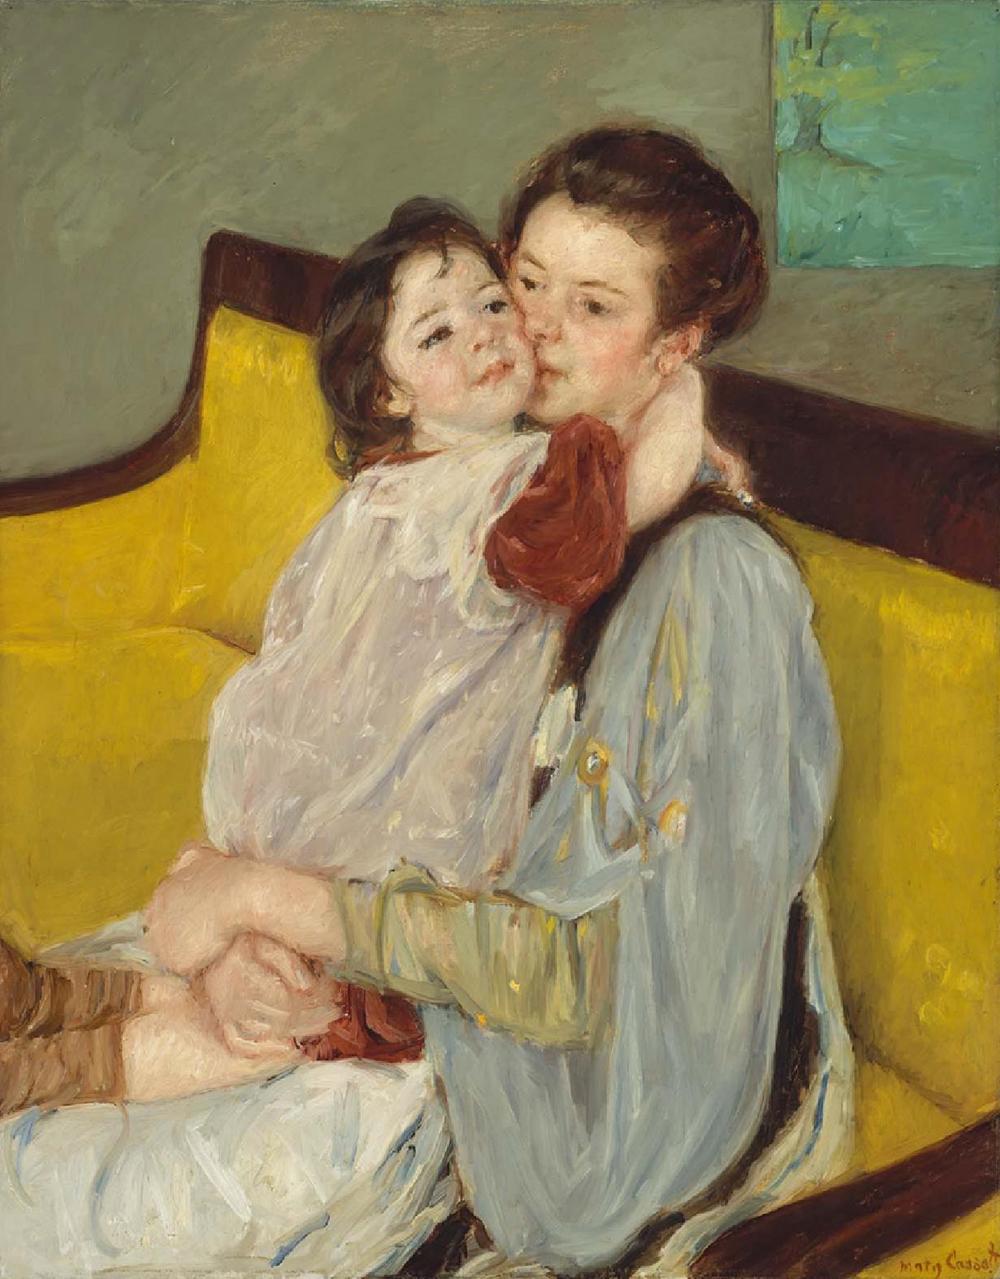 Caresse Maternelle, by Mary Cassatt, c. 1902.